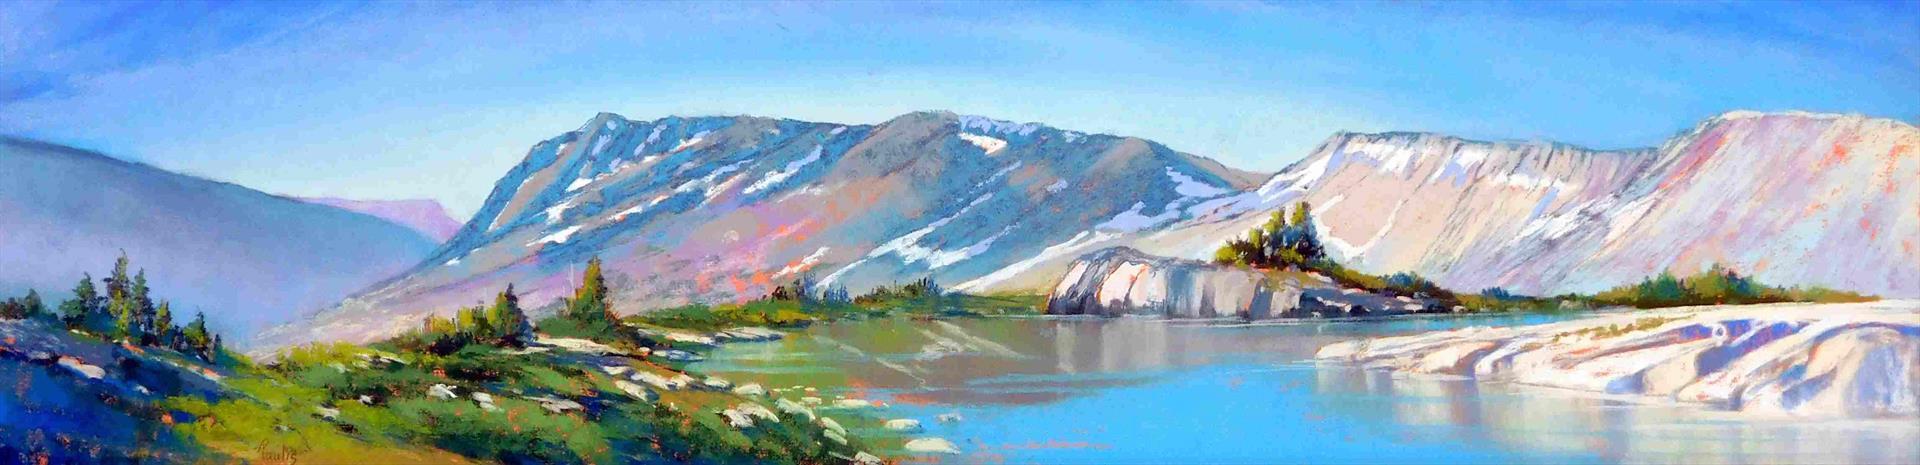 8689-turquoise_tarn__20_lakes_basin-1013201611-956.jpg